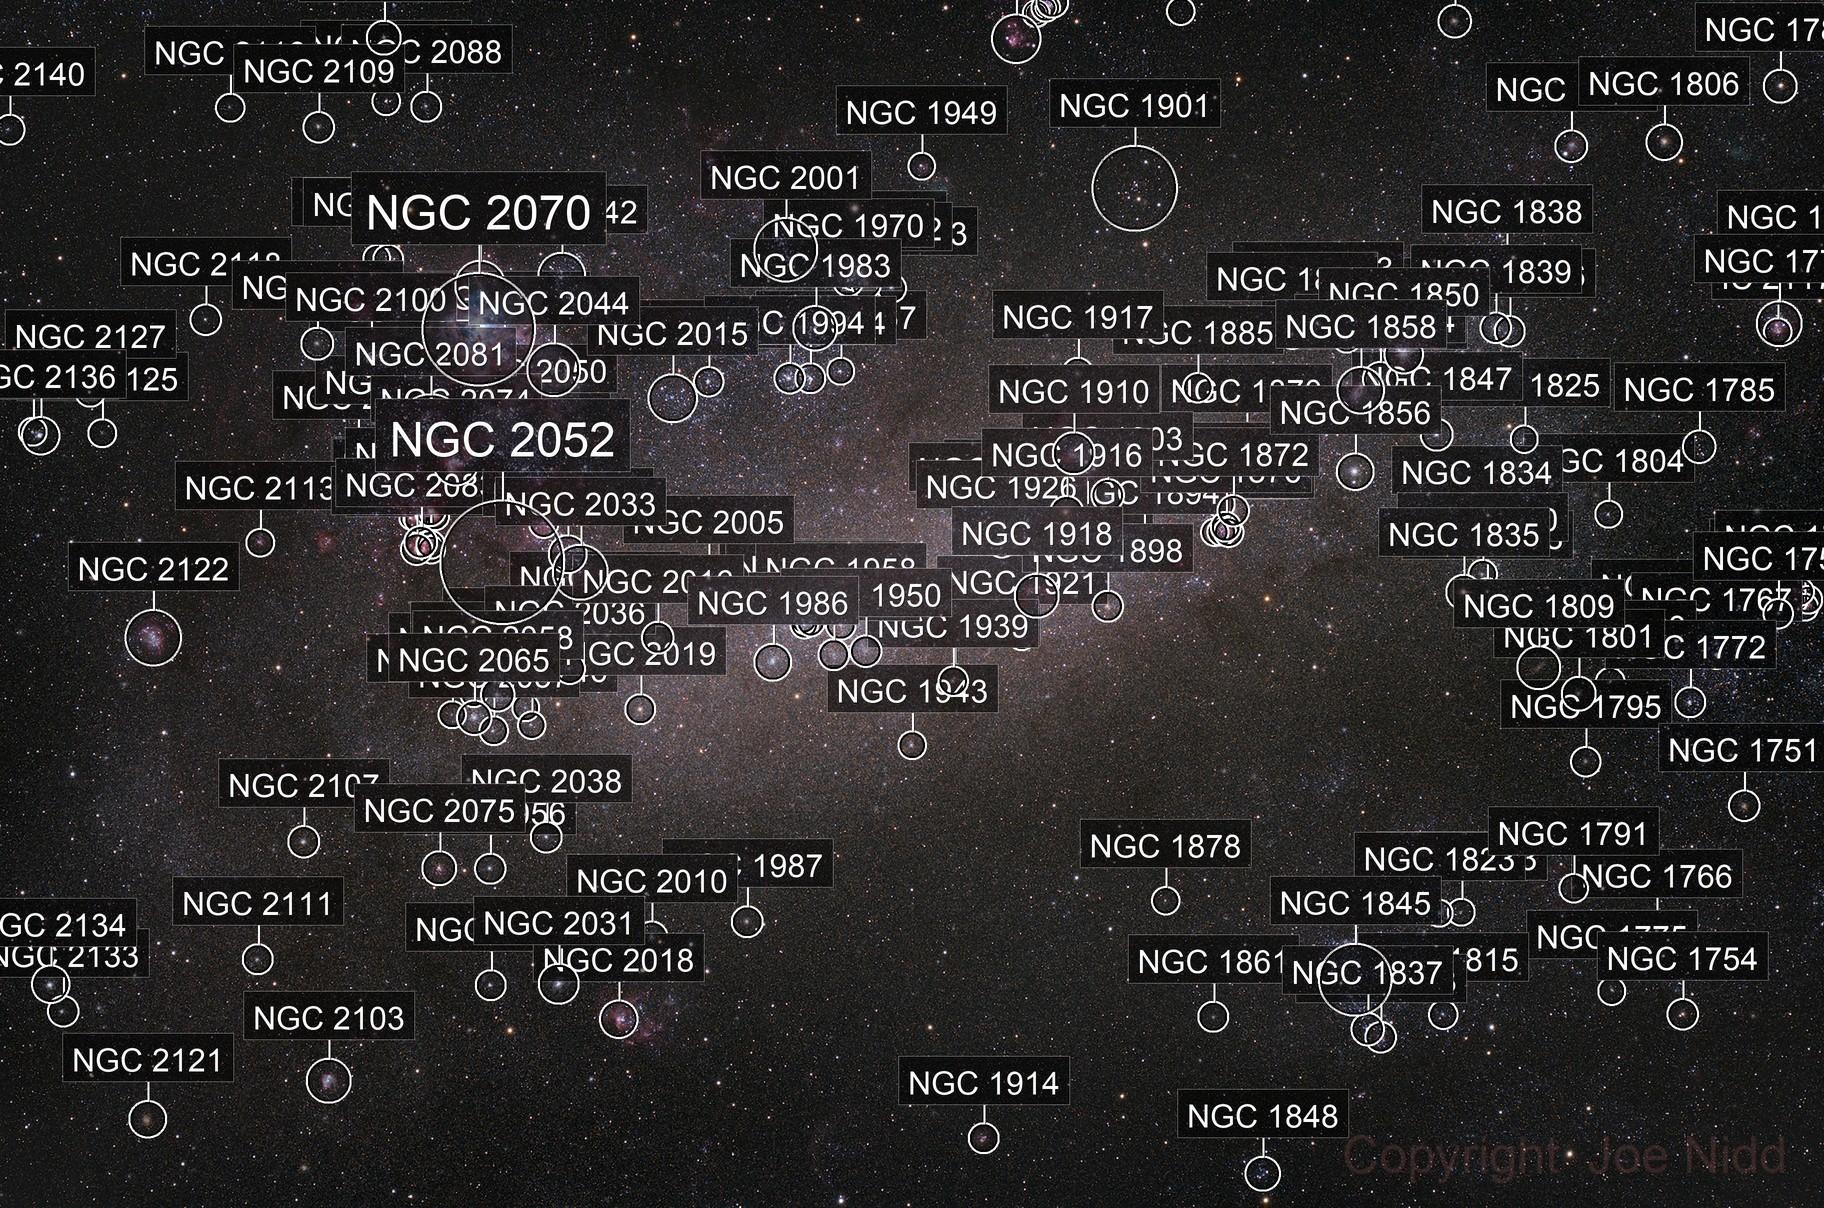 Tarantula Nebula Wide Field and Large Magellanic Cloud (LMC)